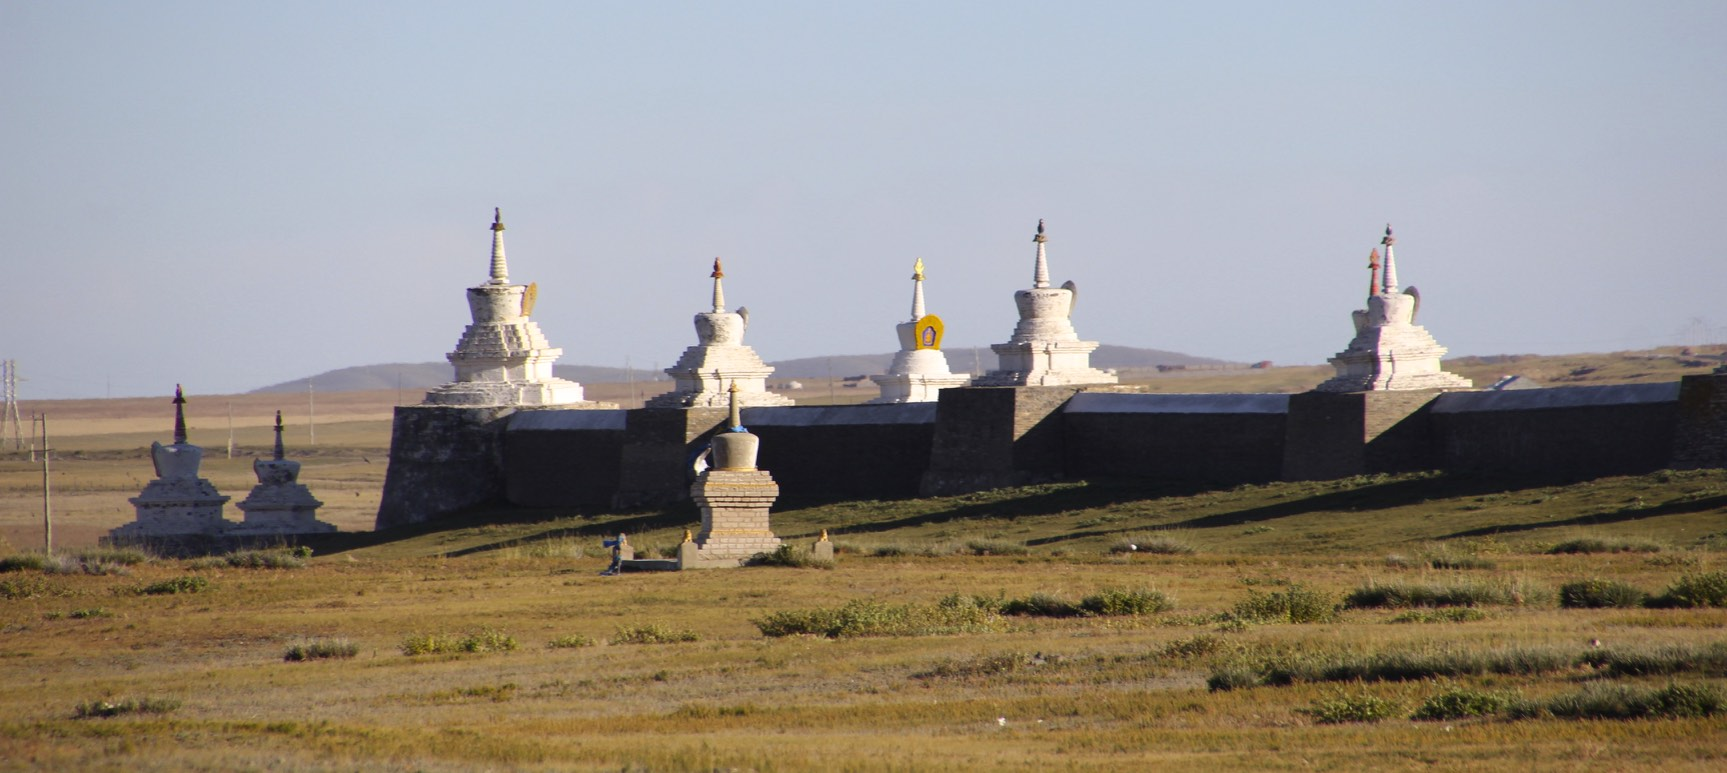 The ancient capital of Genghis Khan - Karakorum